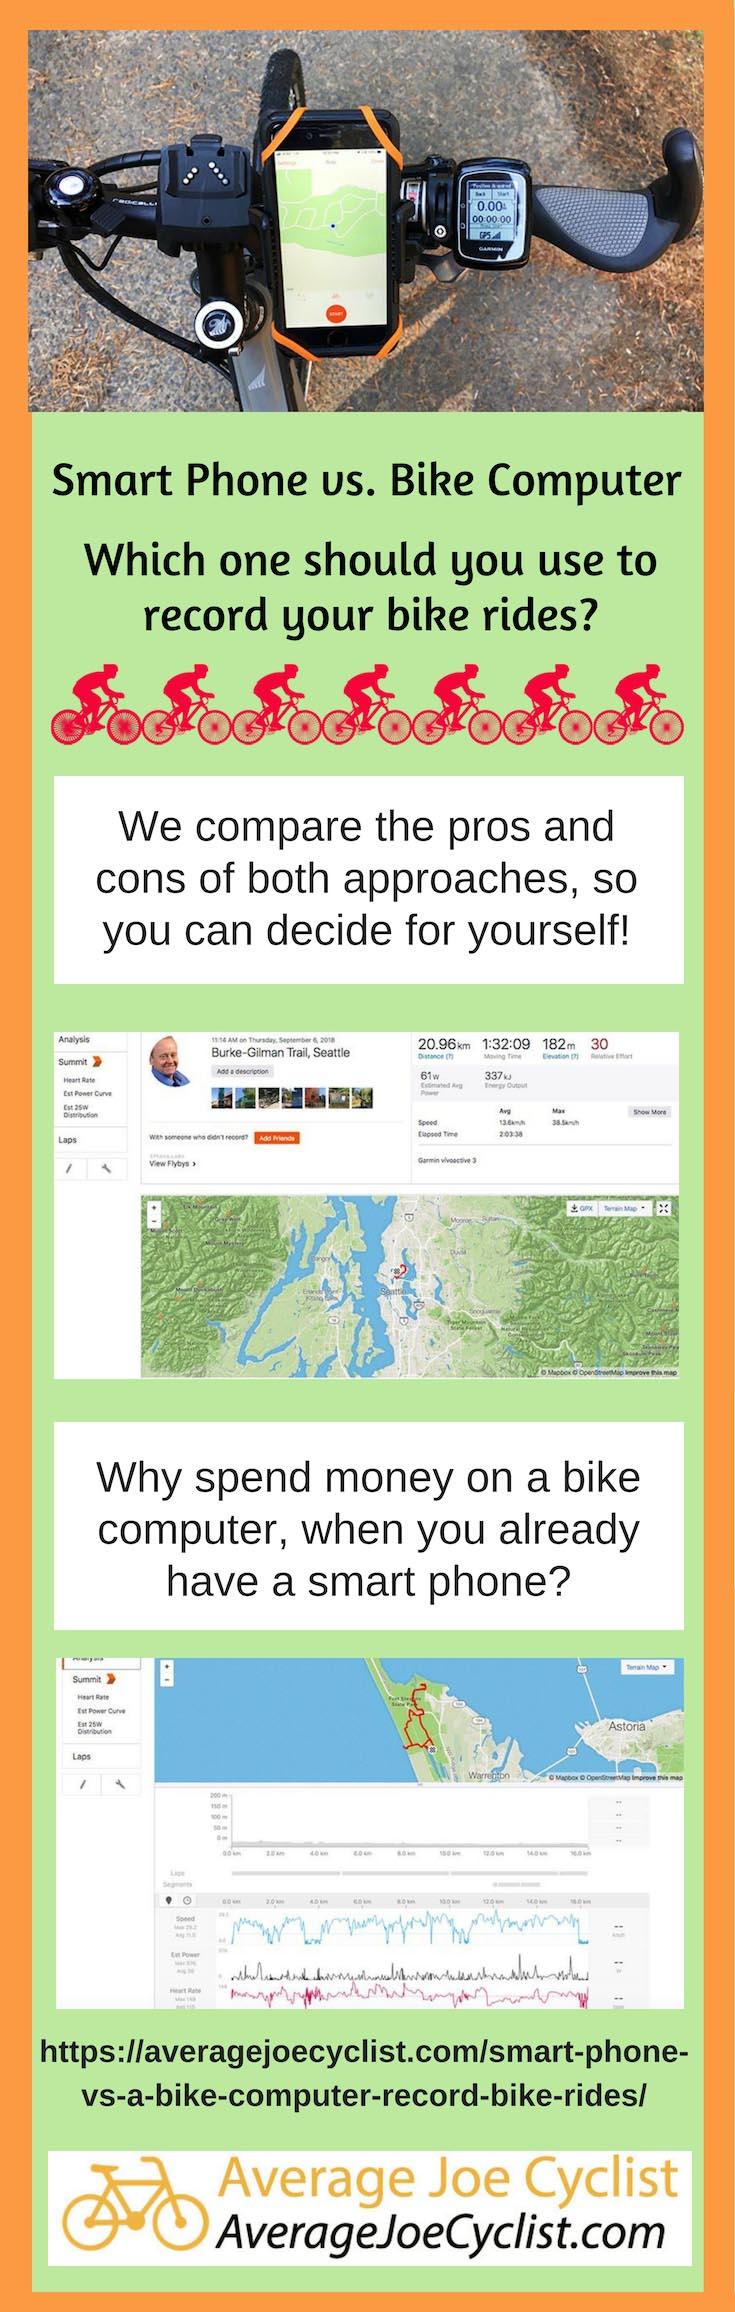 Smart Phone vs a Bike Computer for Recording Bike Rides